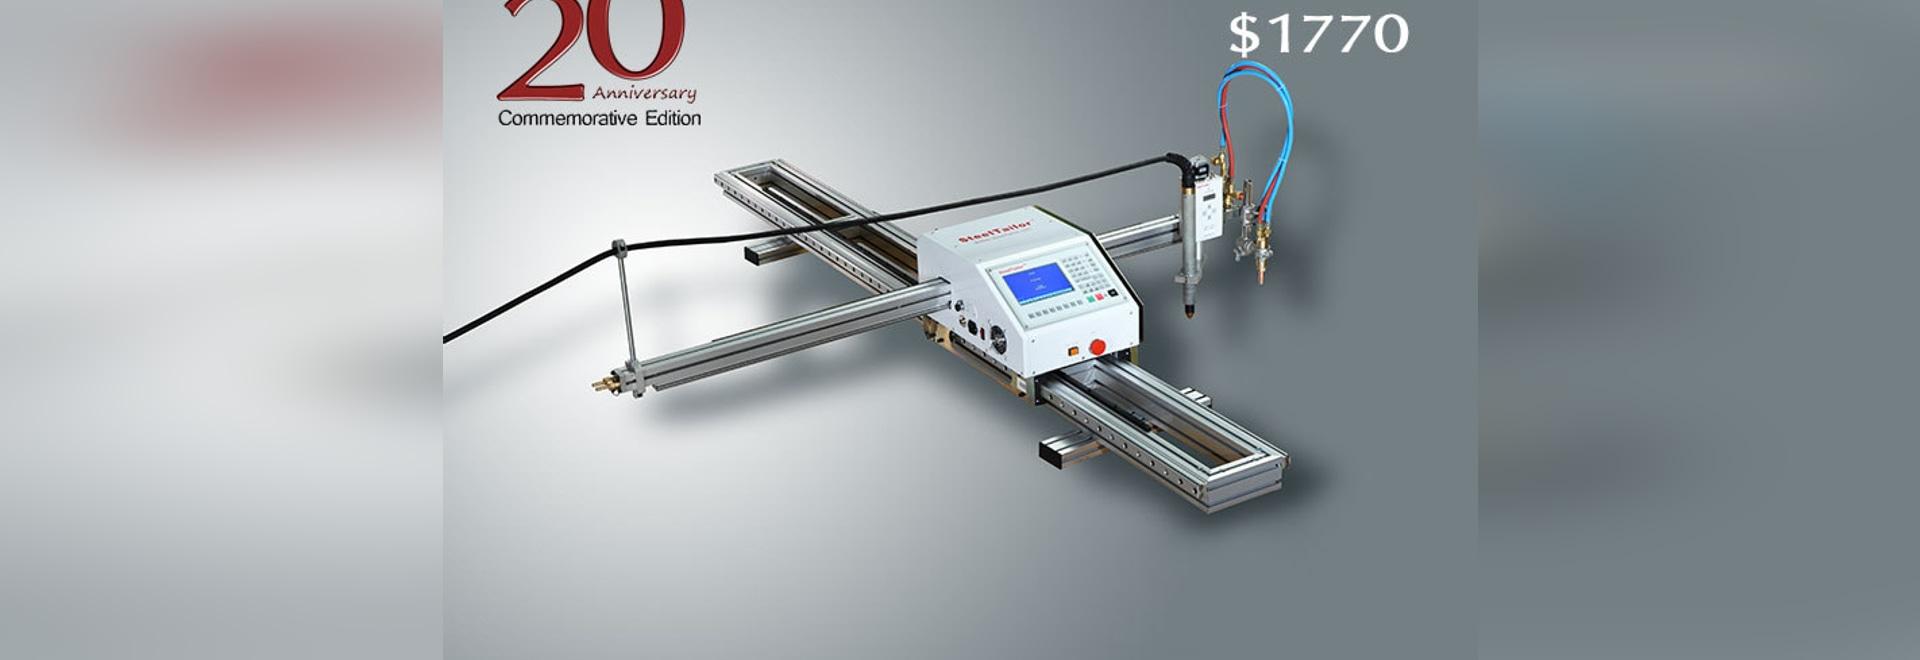 Steeltailor professional portable cnc machines